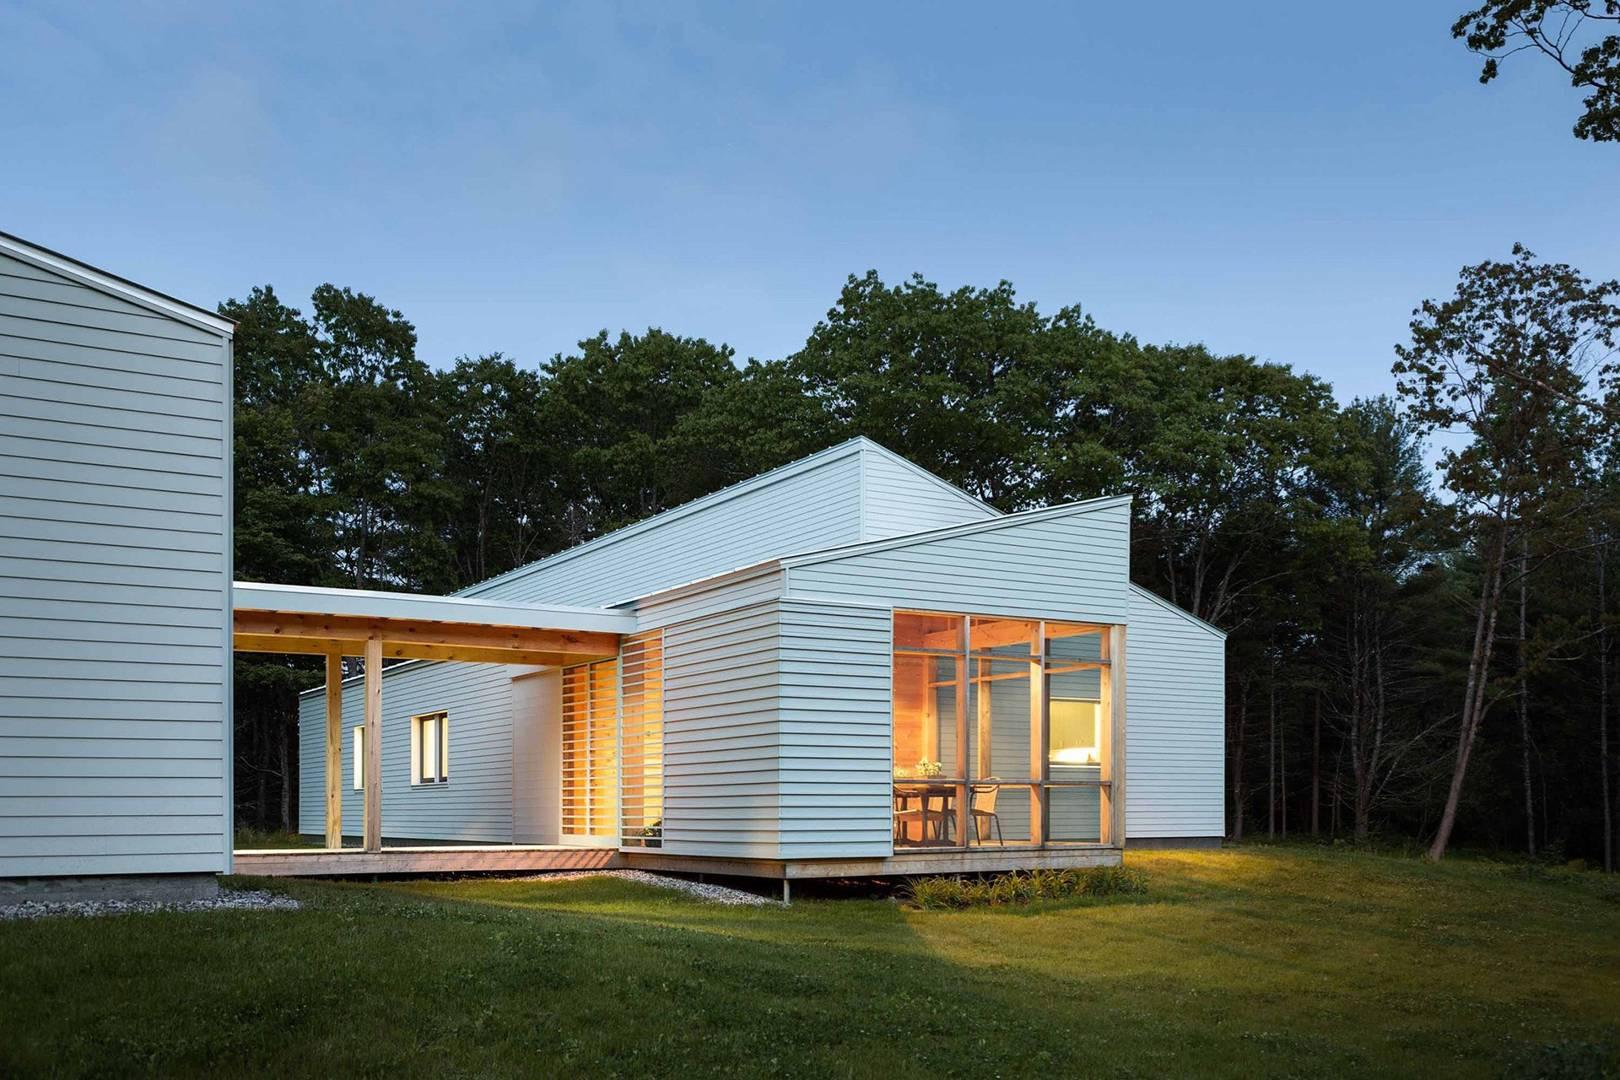 Prefab Homes - 5 Stylish Modern House Kits | House & Garden